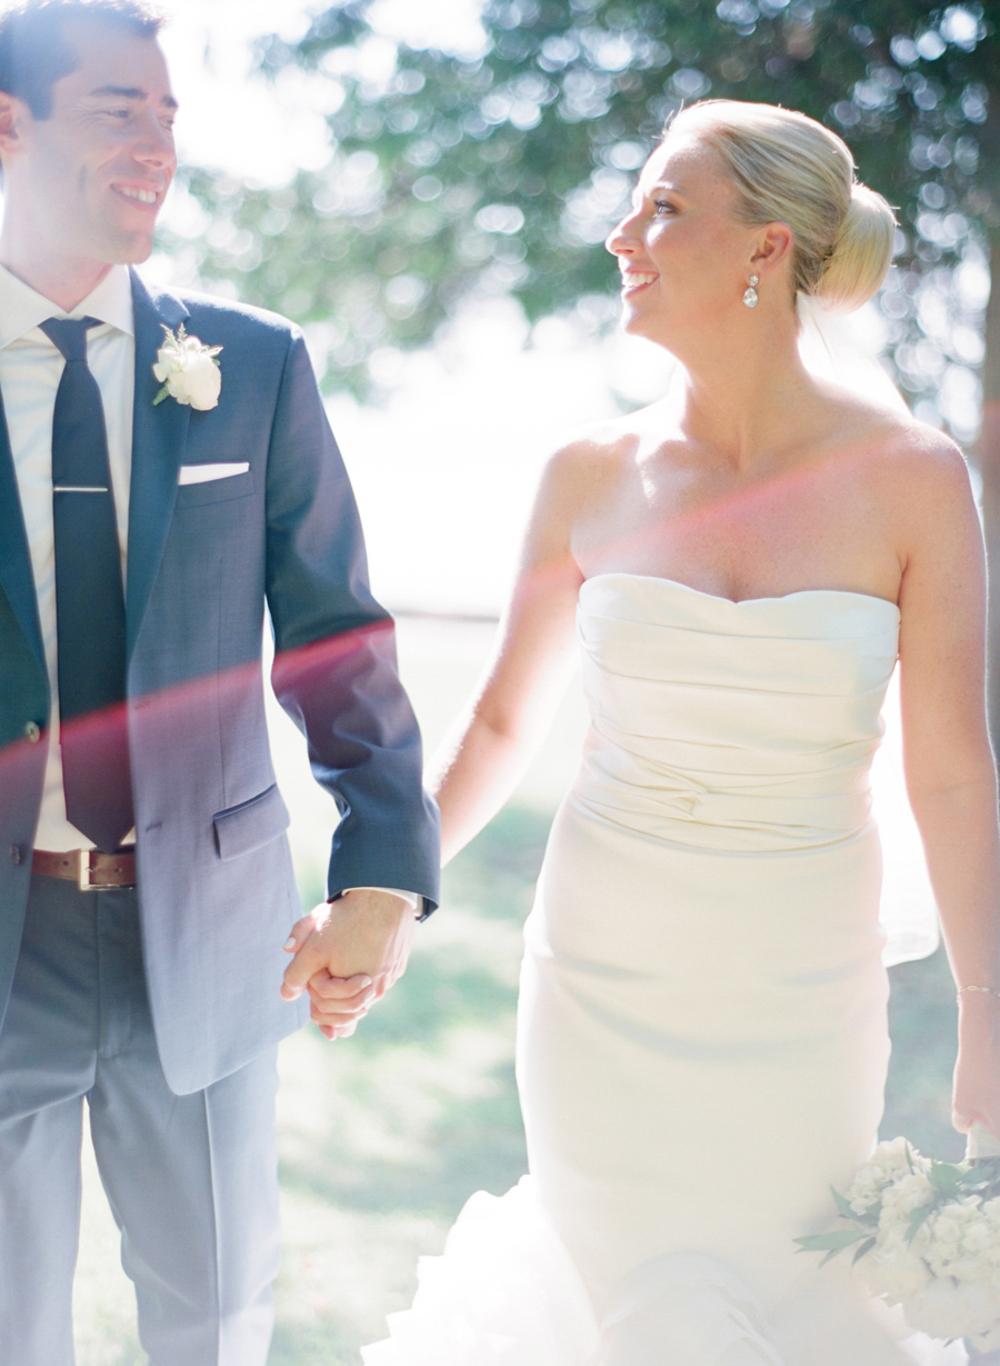 About_Thyme_Farm_Door_County_Wedding_022.jpg